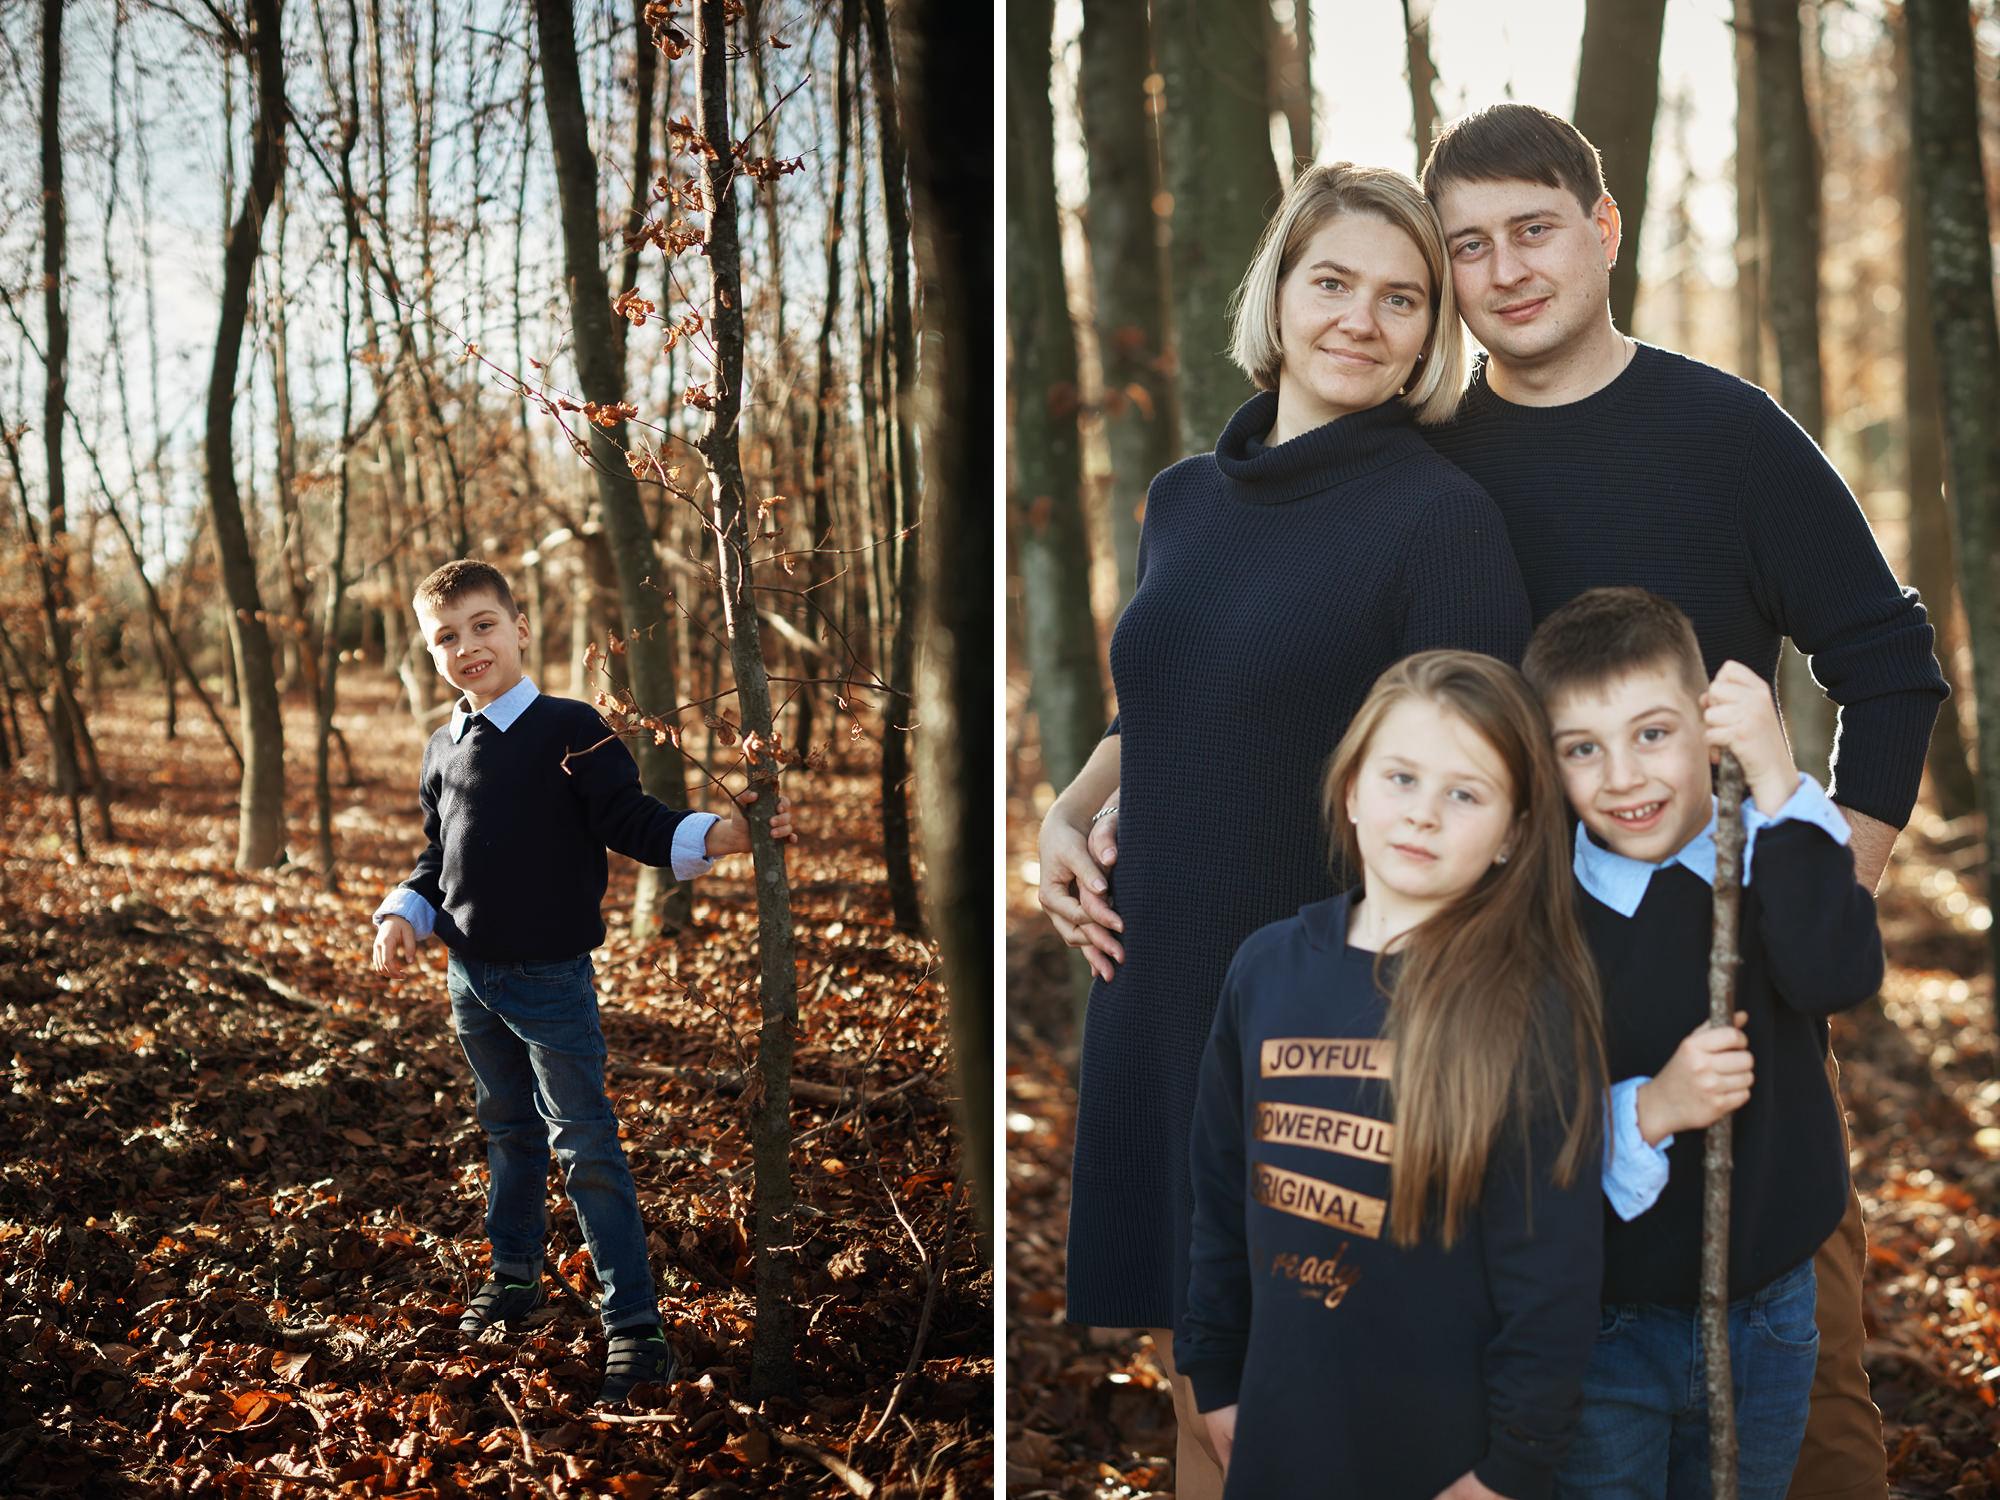 Familienfotos Ulm Familienfotograf Martin Spoerl Photography 0016